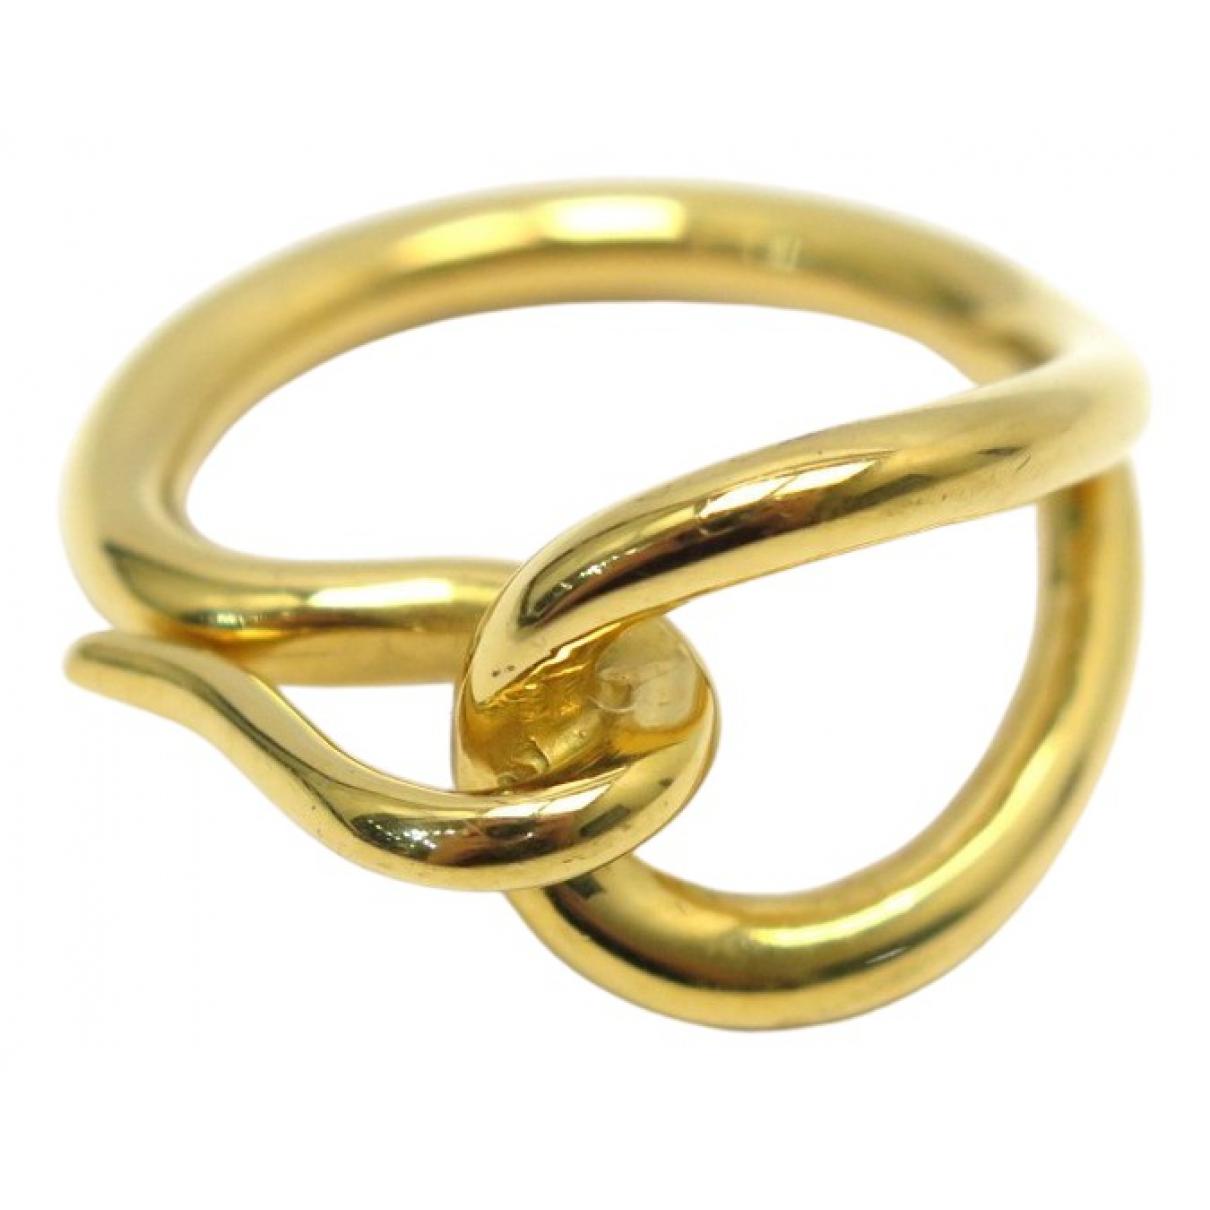 Hermes - Foulard   pour femme en metal - dore